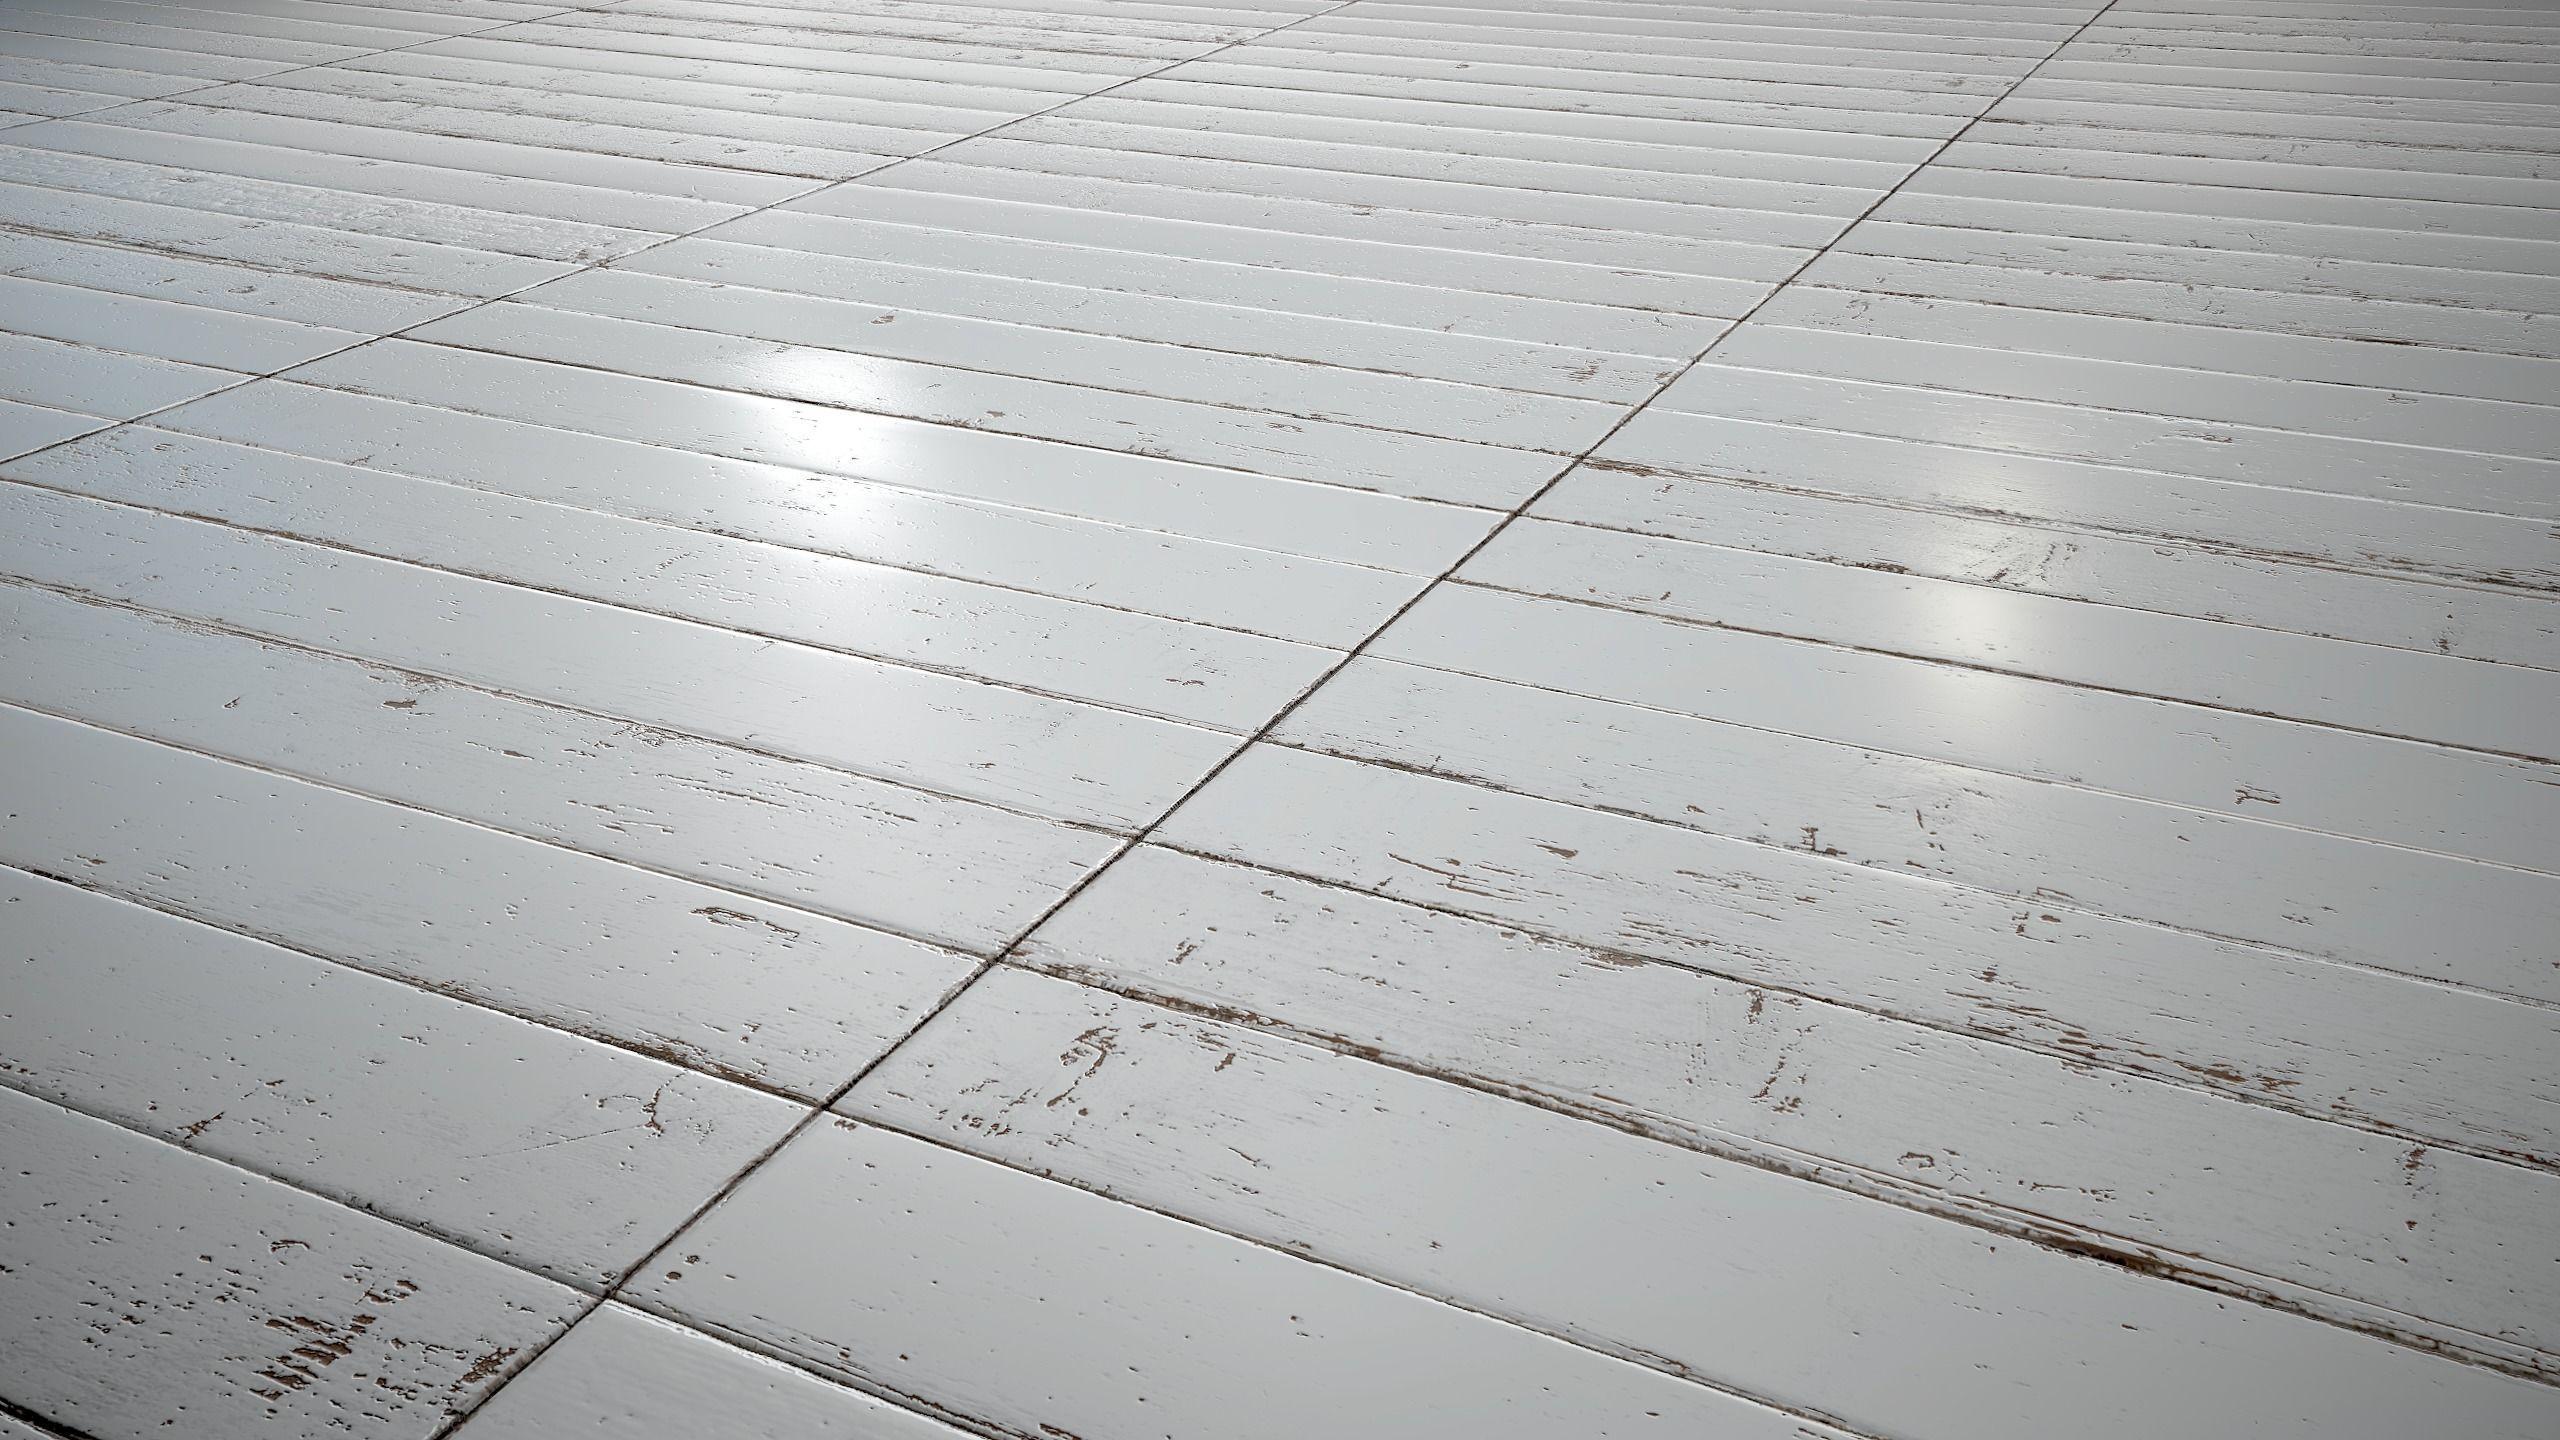 White Painted stackbond parquet - PBR textures